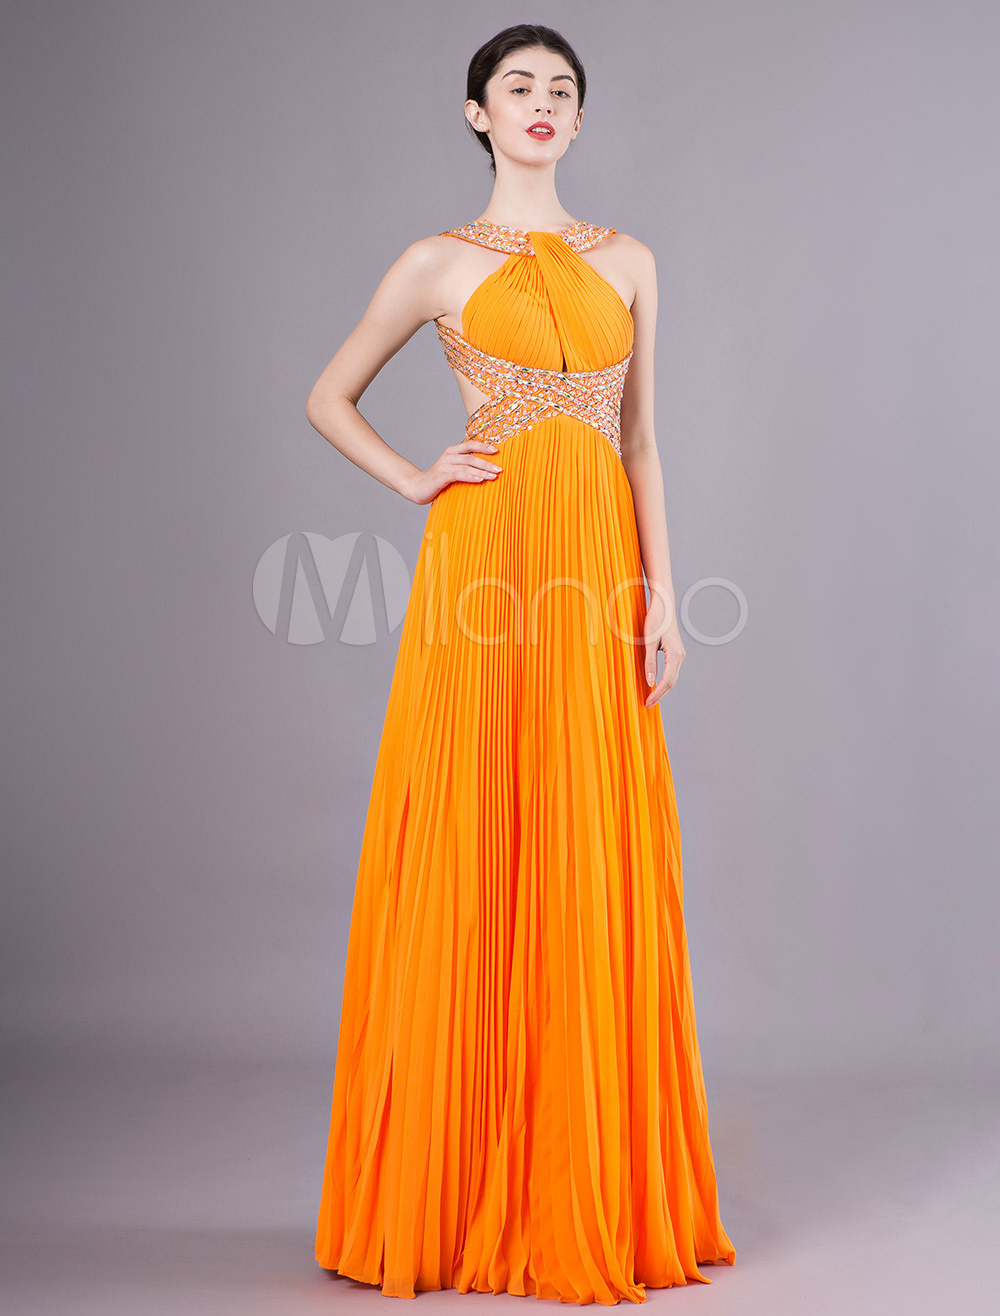 680f678cf3e41 Prom Dresses Orange Pleated Halter Chiffon Beading Backless Maxi Evening  Dress-No.1 ...